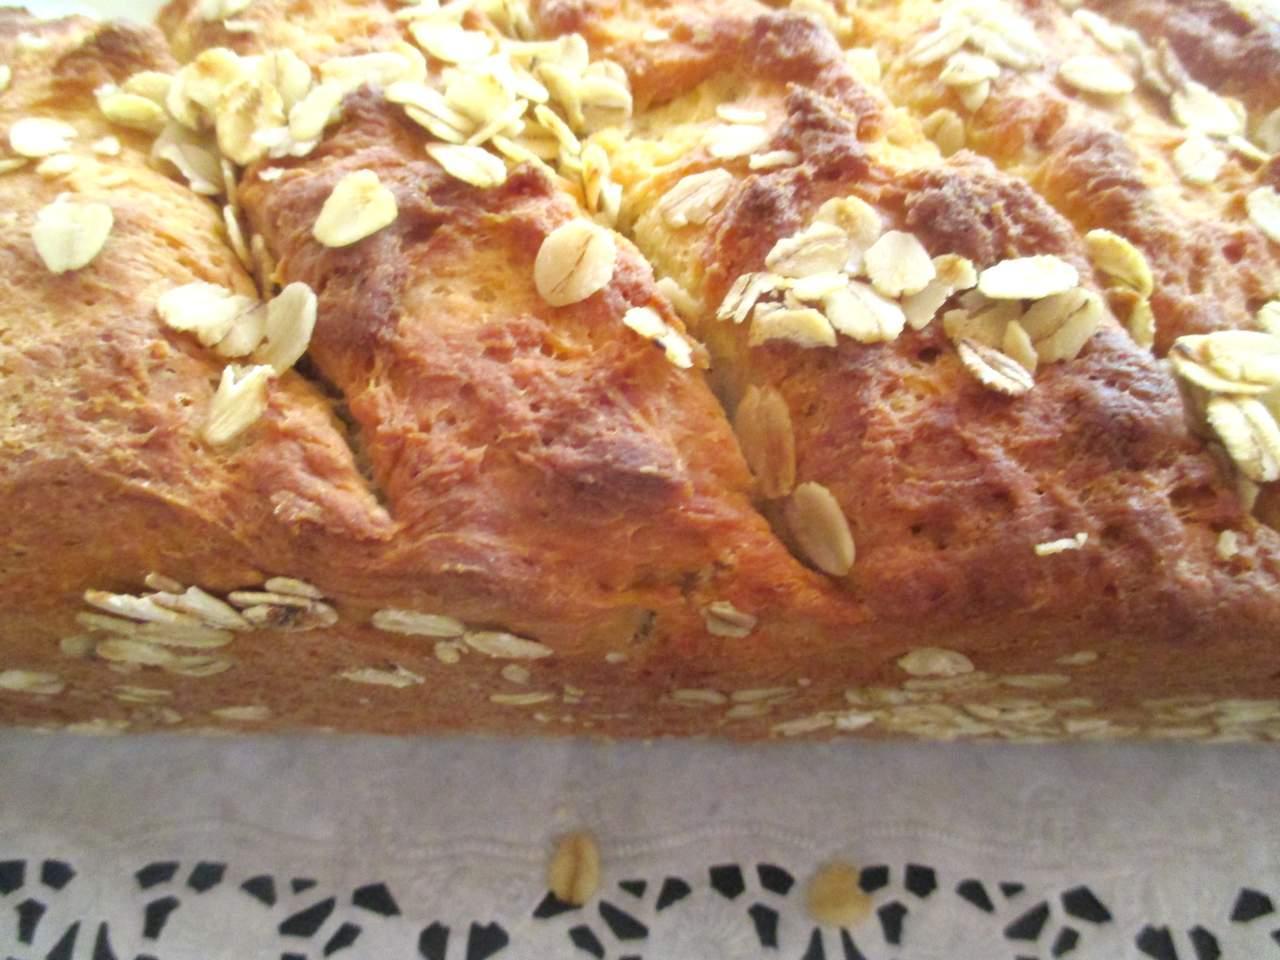 zum Servieren fertiges Dinkelbrot Low Carb Apfelmus-Quark Brot